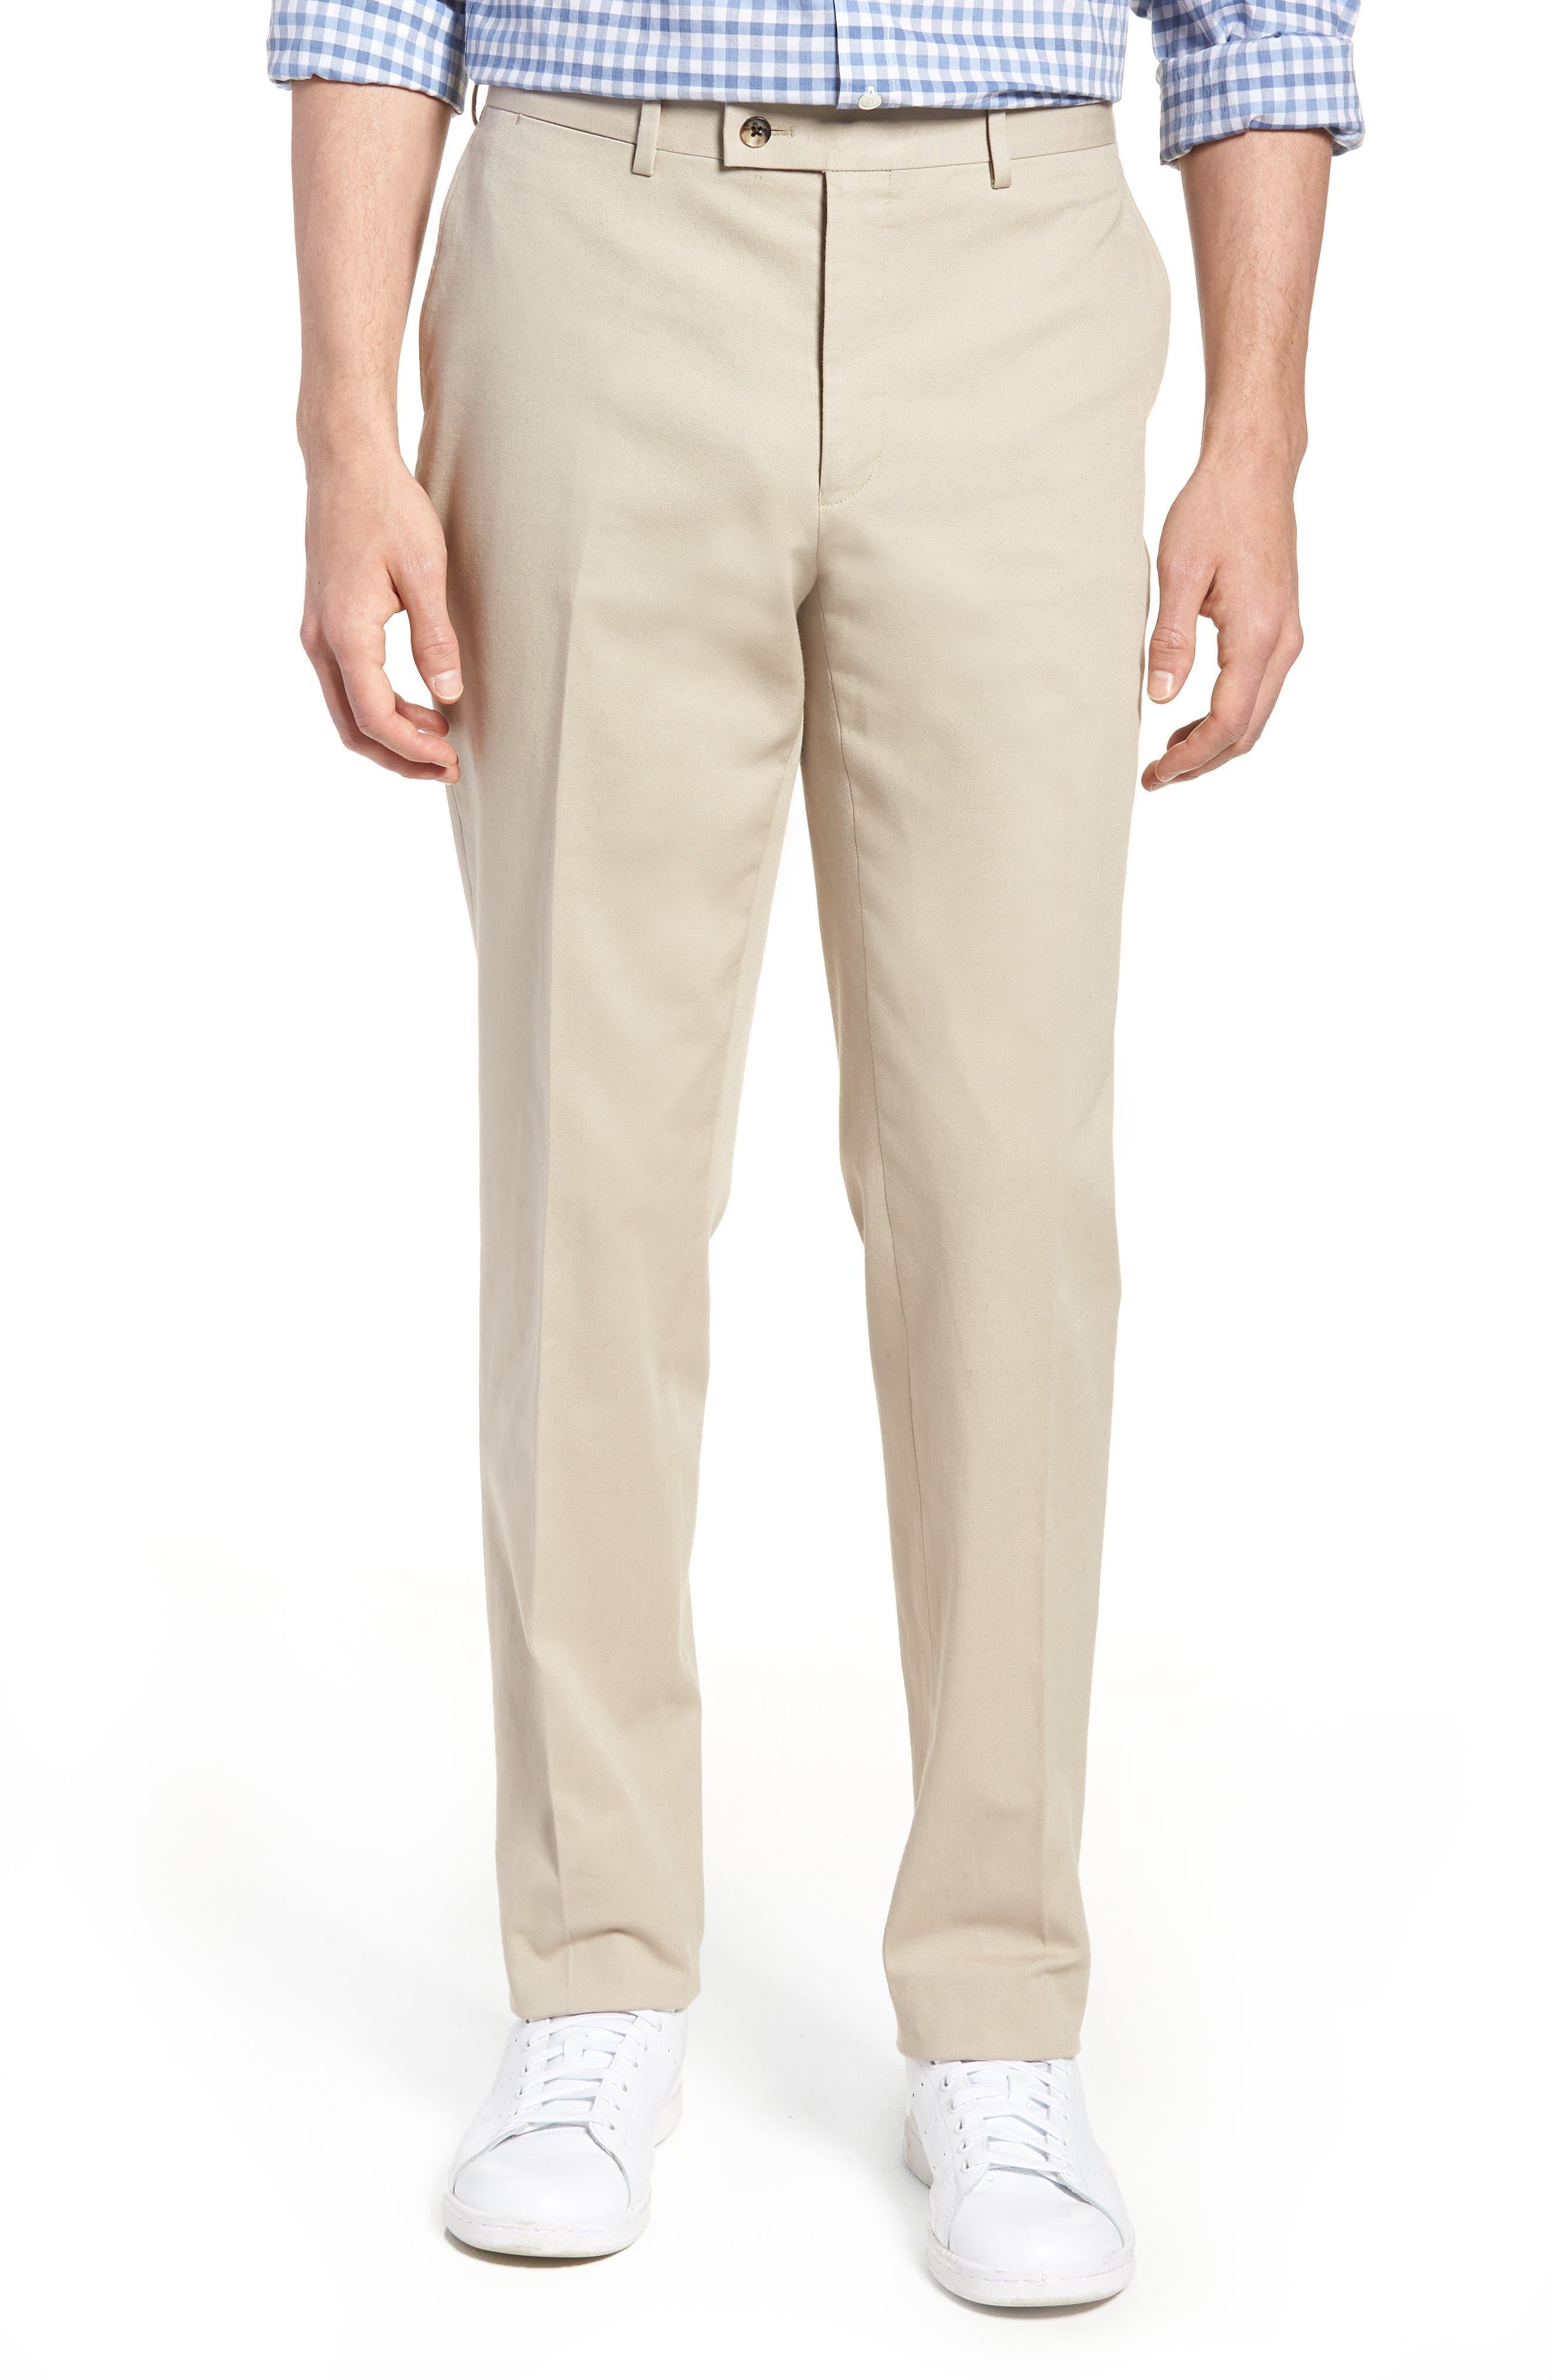 Finchley Regular Fit Pants,                             Main thumbnail 1, color,                             102